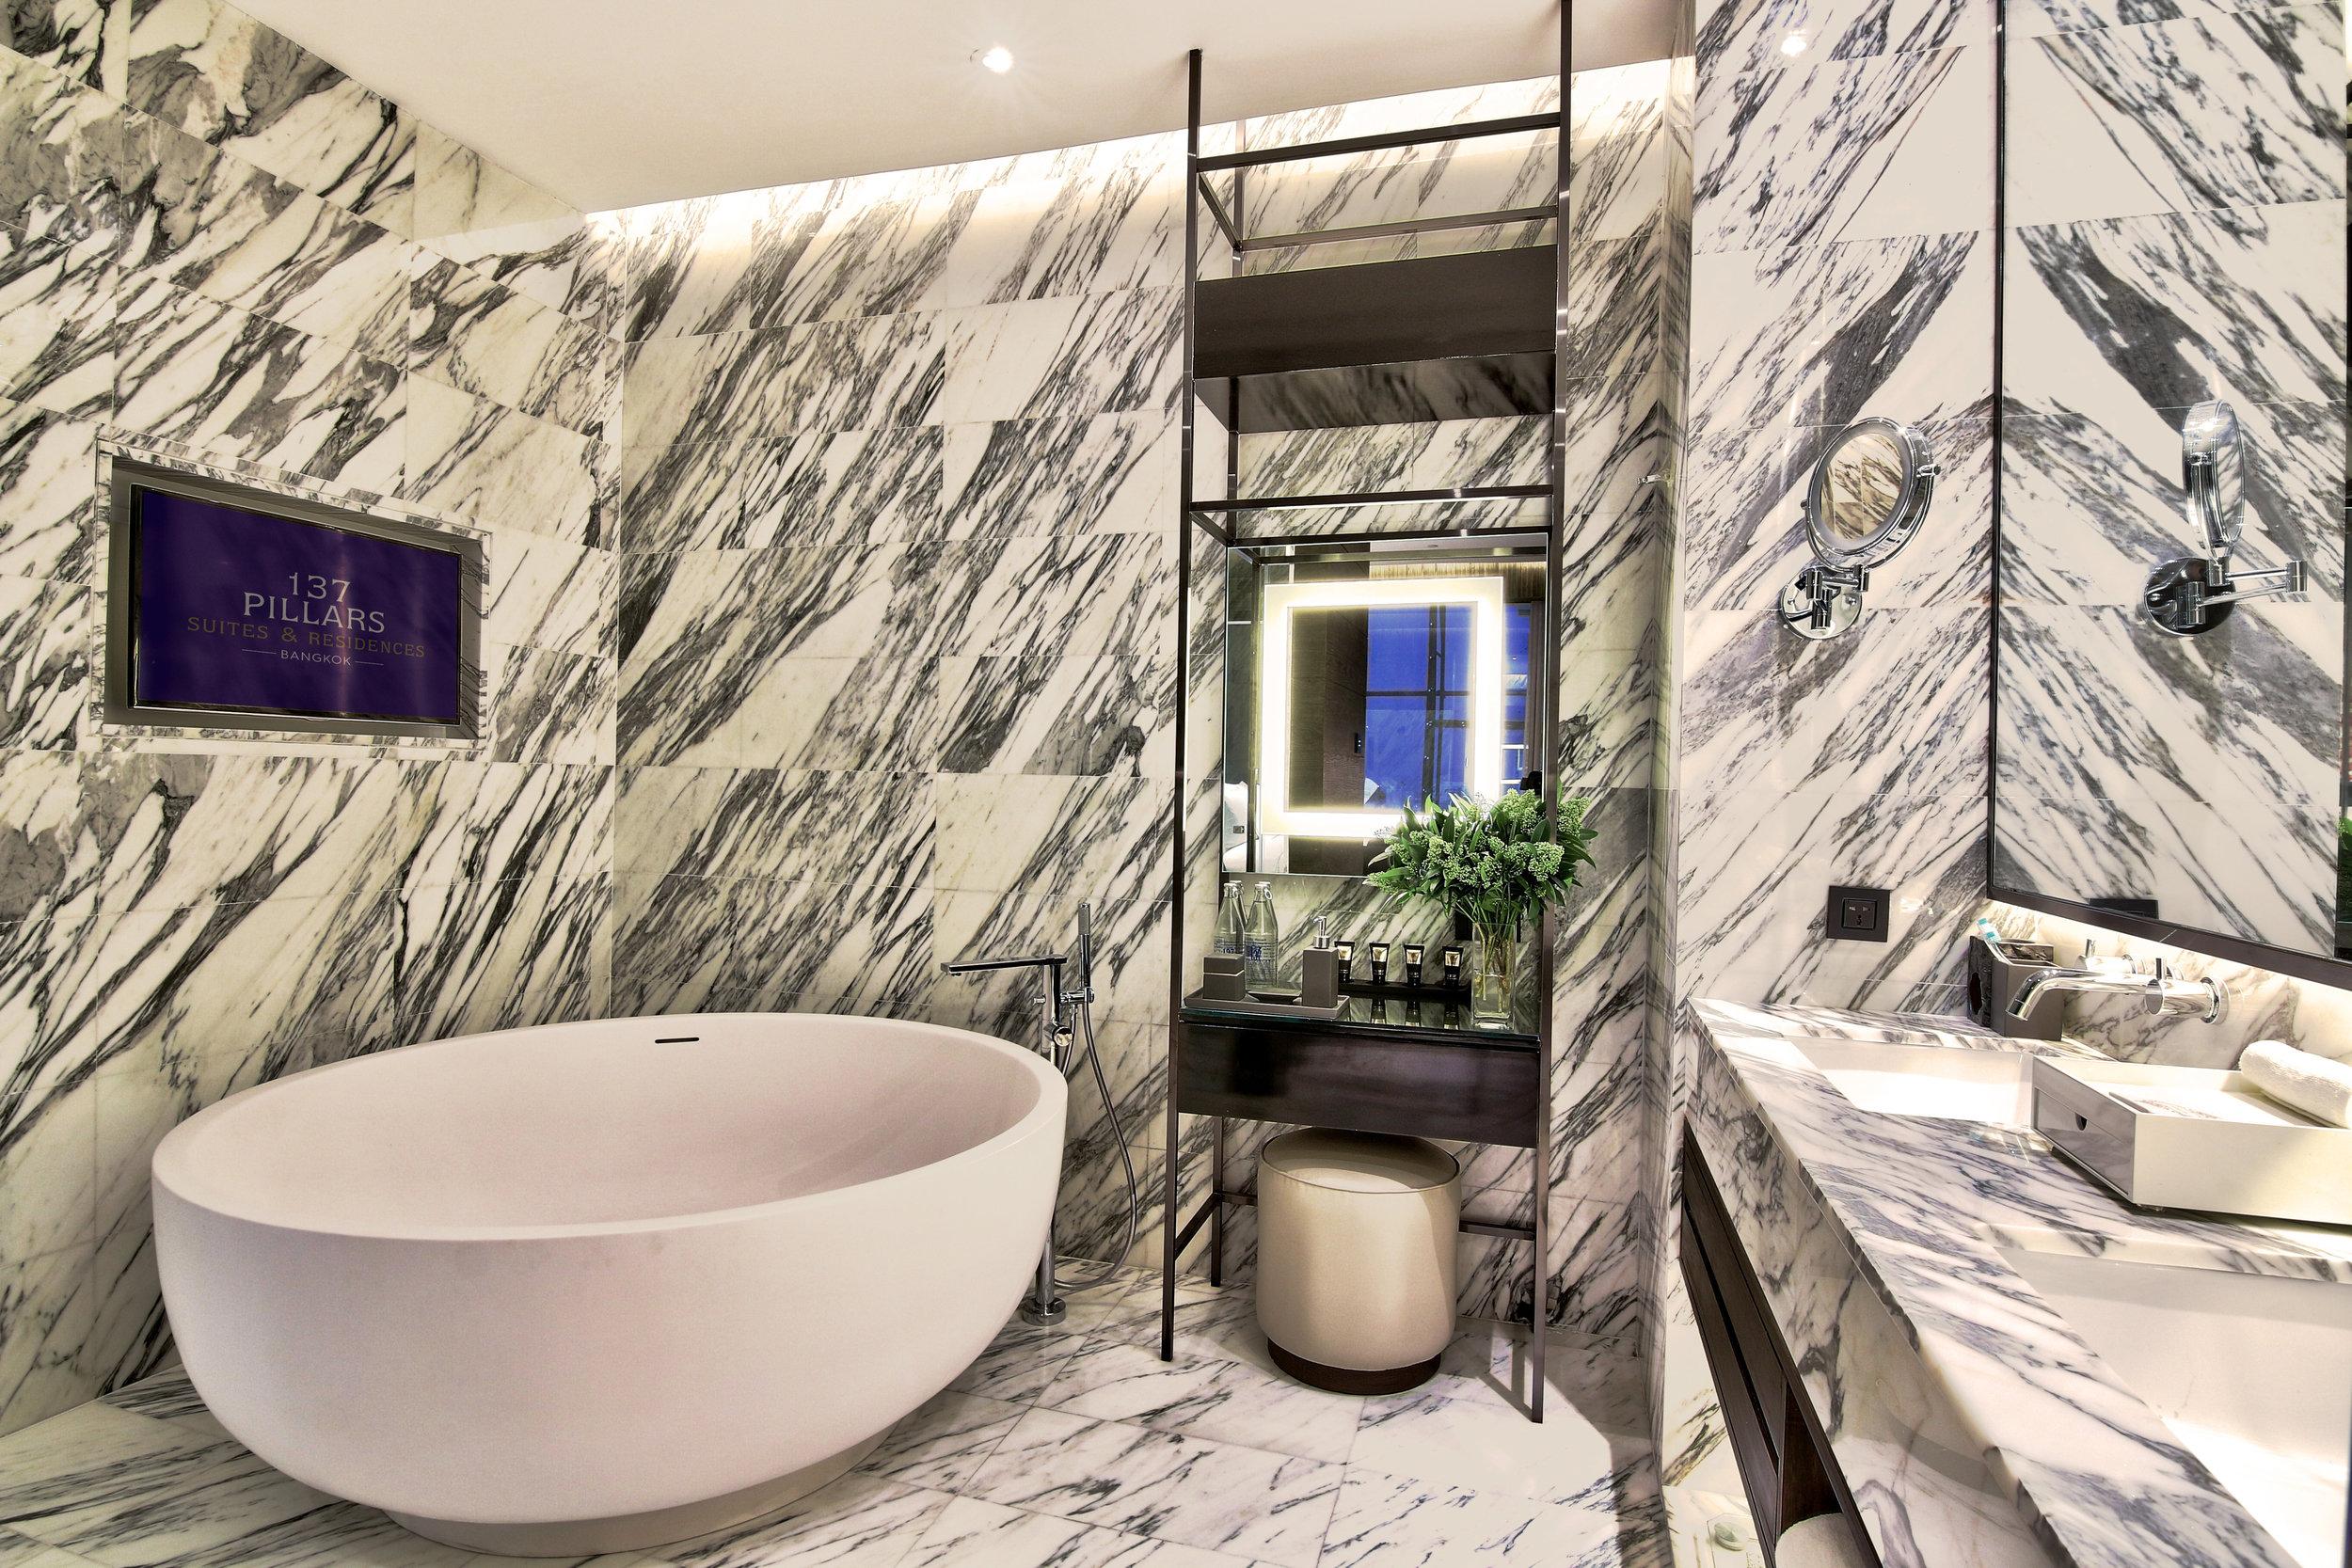 01 Ayutthaya Suite  Bathroom with 137 Pillars TV.jpg